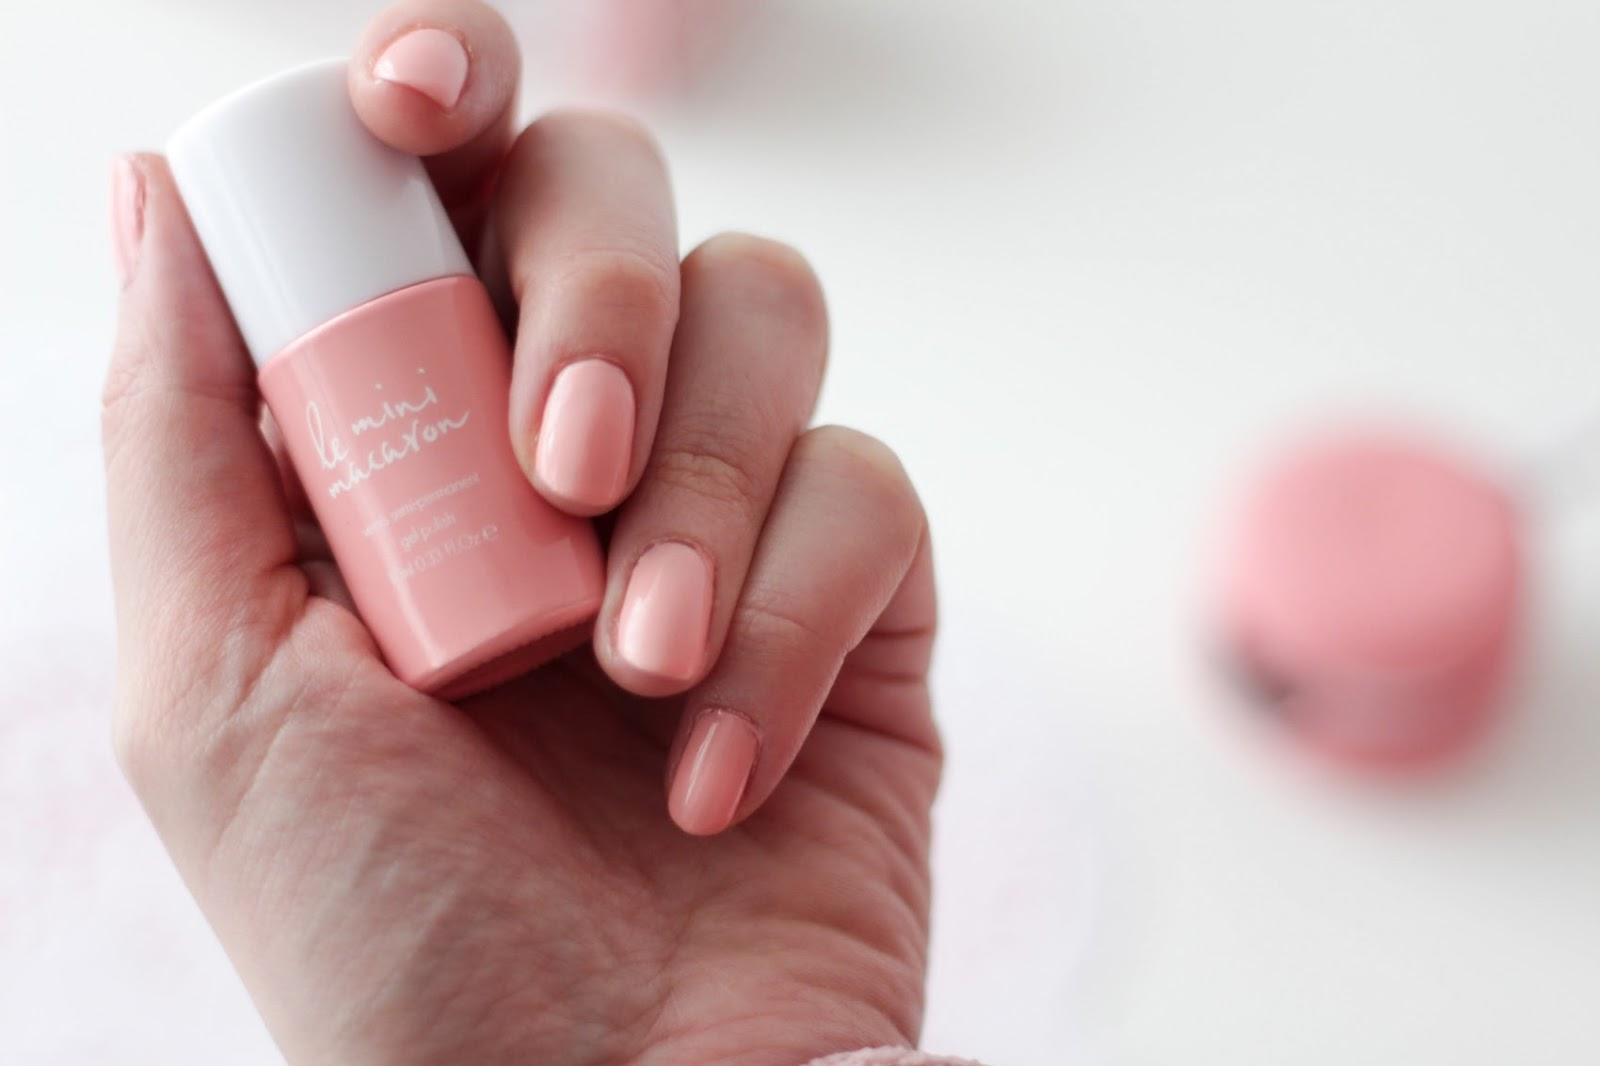 Le mini macaron: la manicure gel facile e prêt-a-porter!